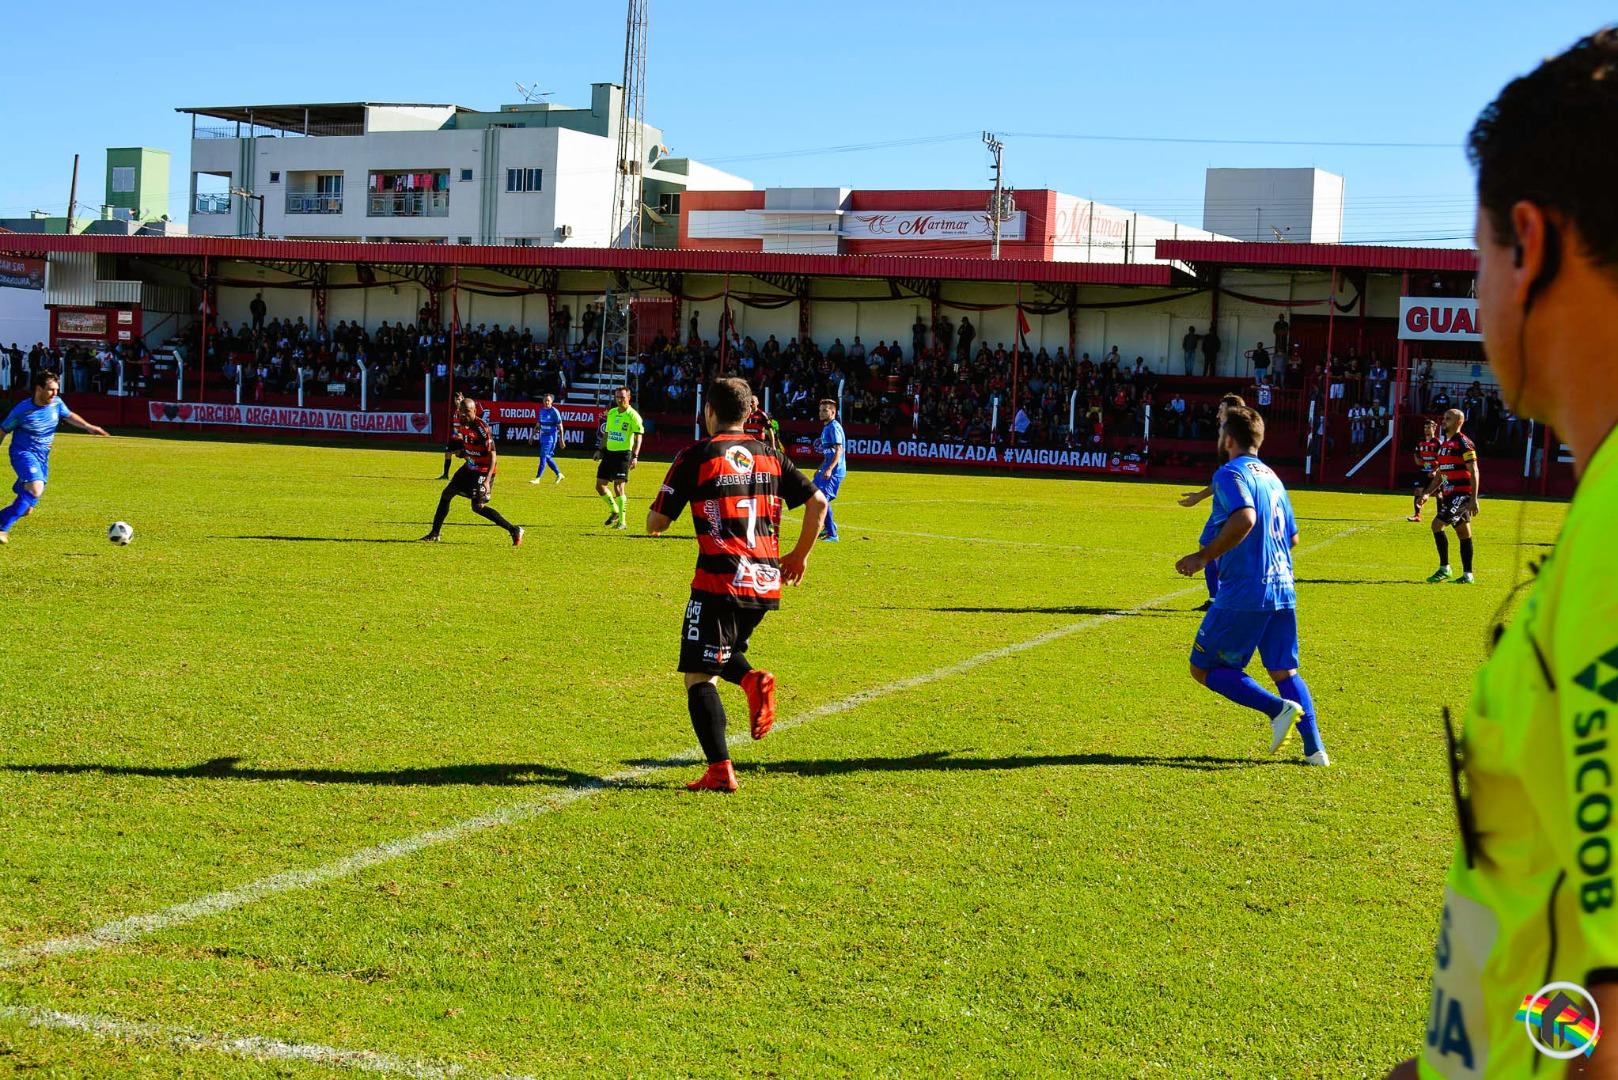 Guarani vence em casa pelo Estadual de Amadores